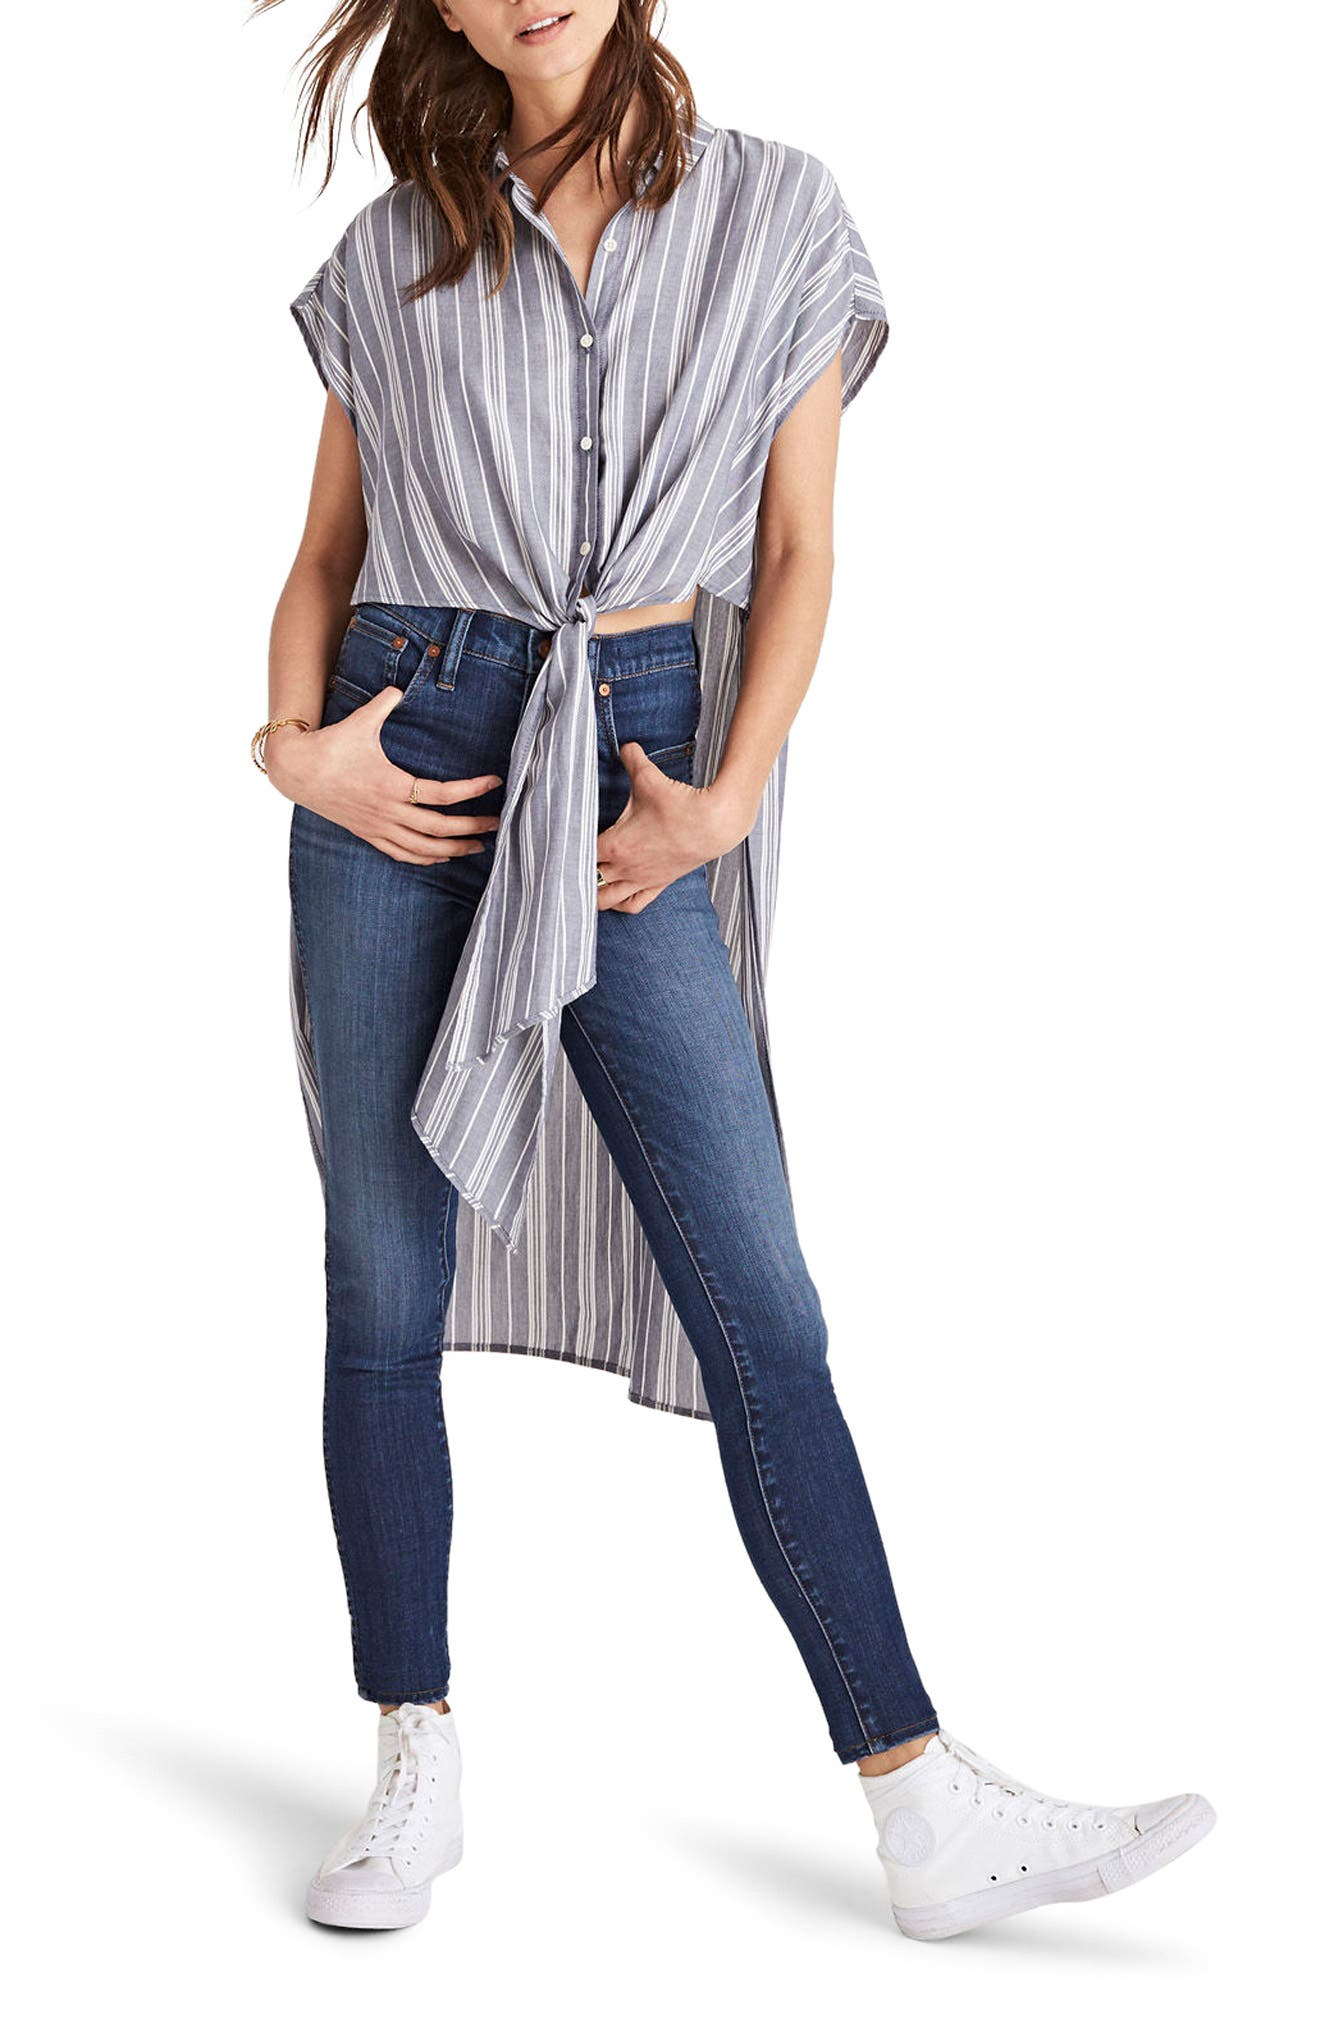 Alternate Image 1 Selected - Madewell Side Slit Tunic Shirt